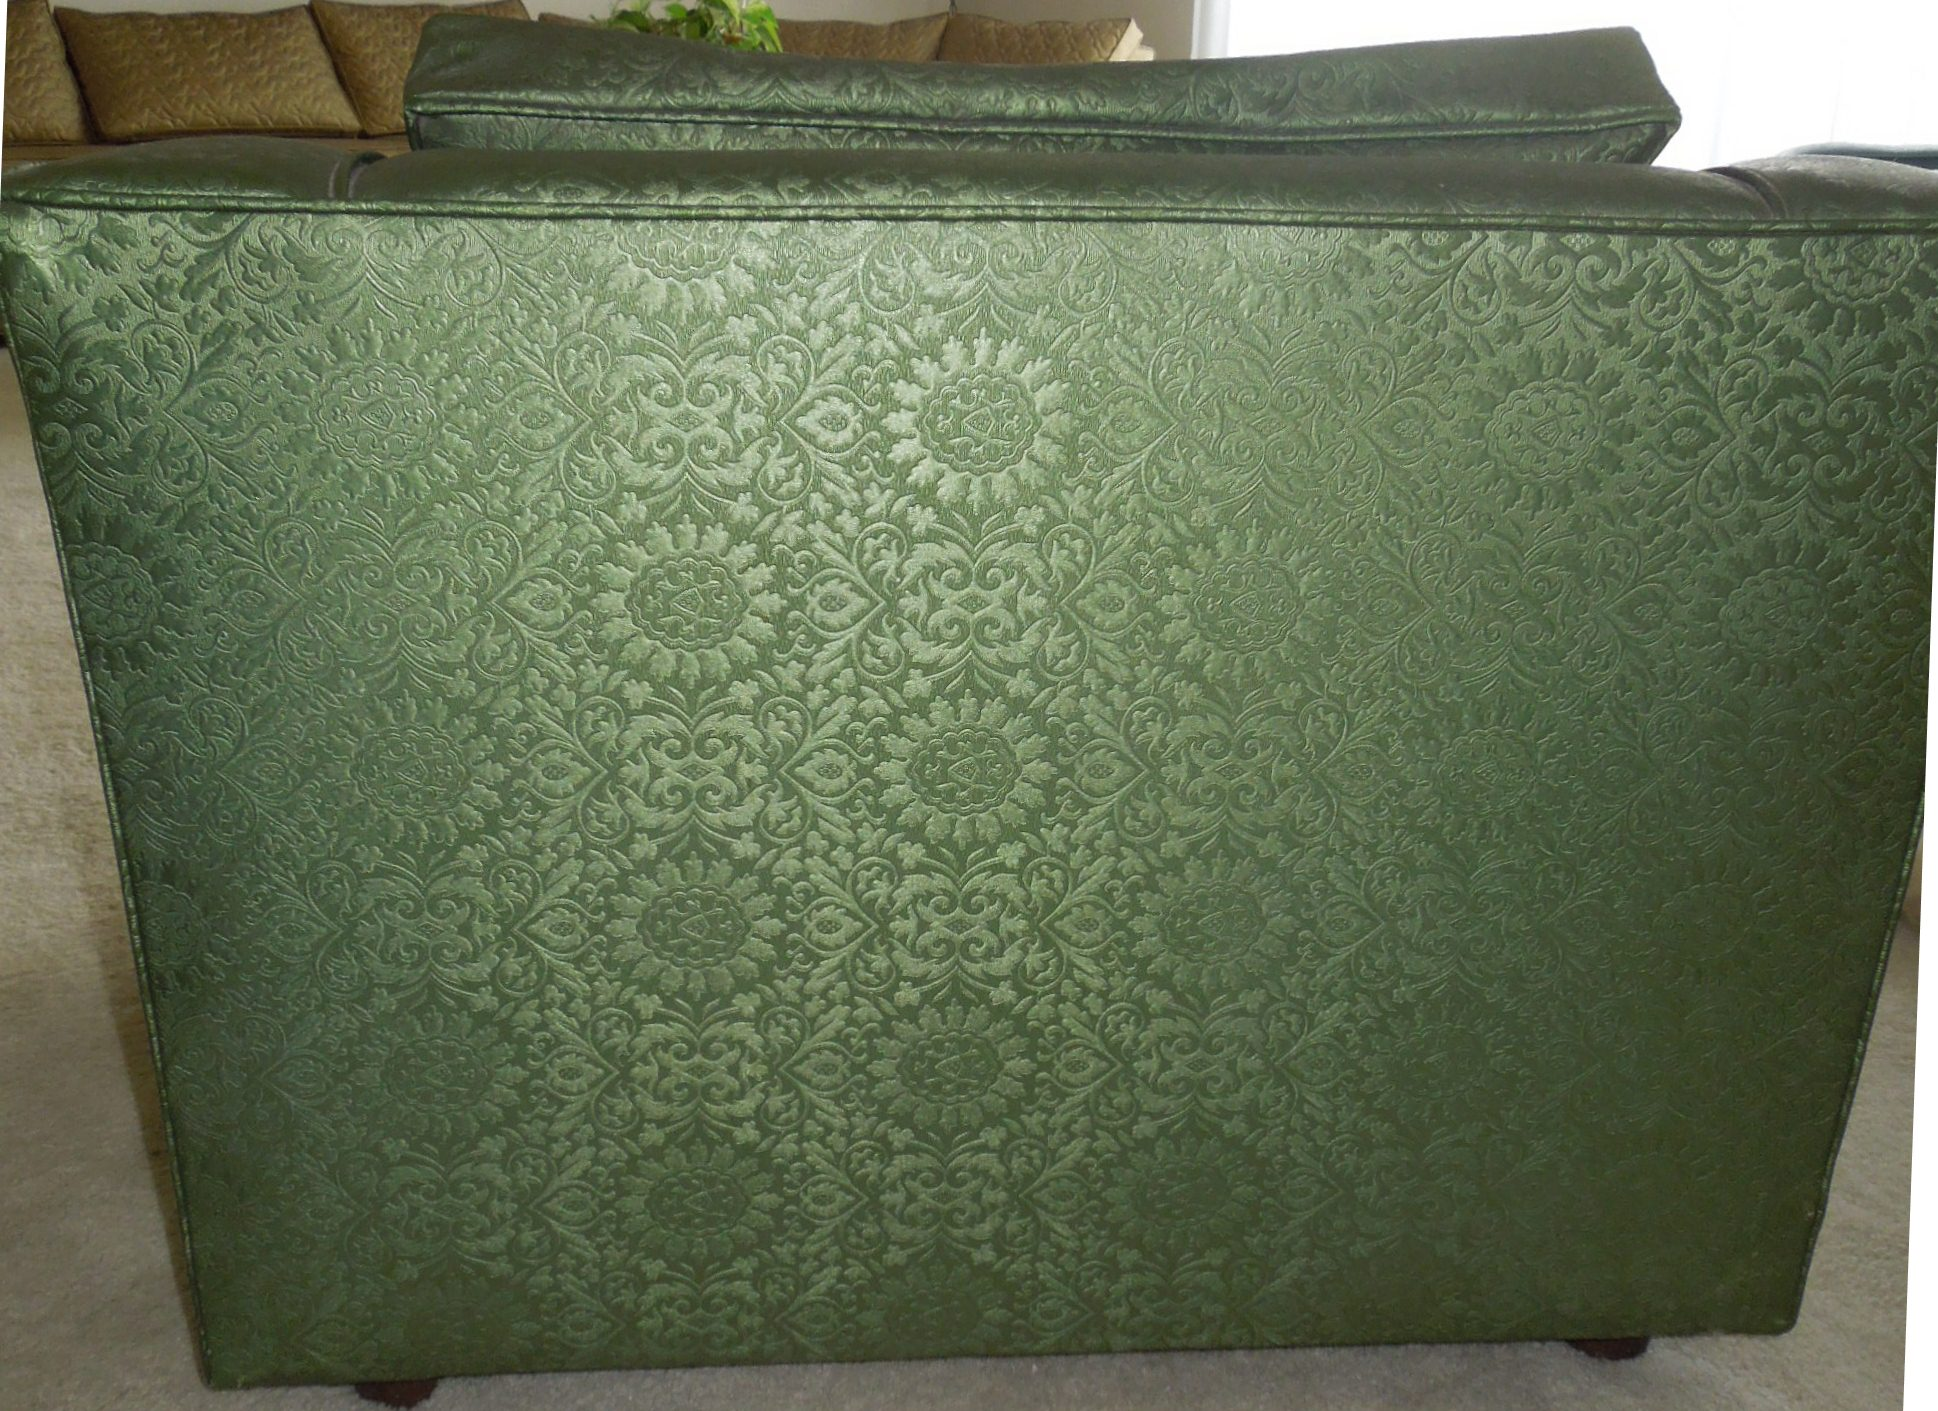 Vintage 1960s Luxury Lounge Chair Vinyl Green Color For Sale Antiques